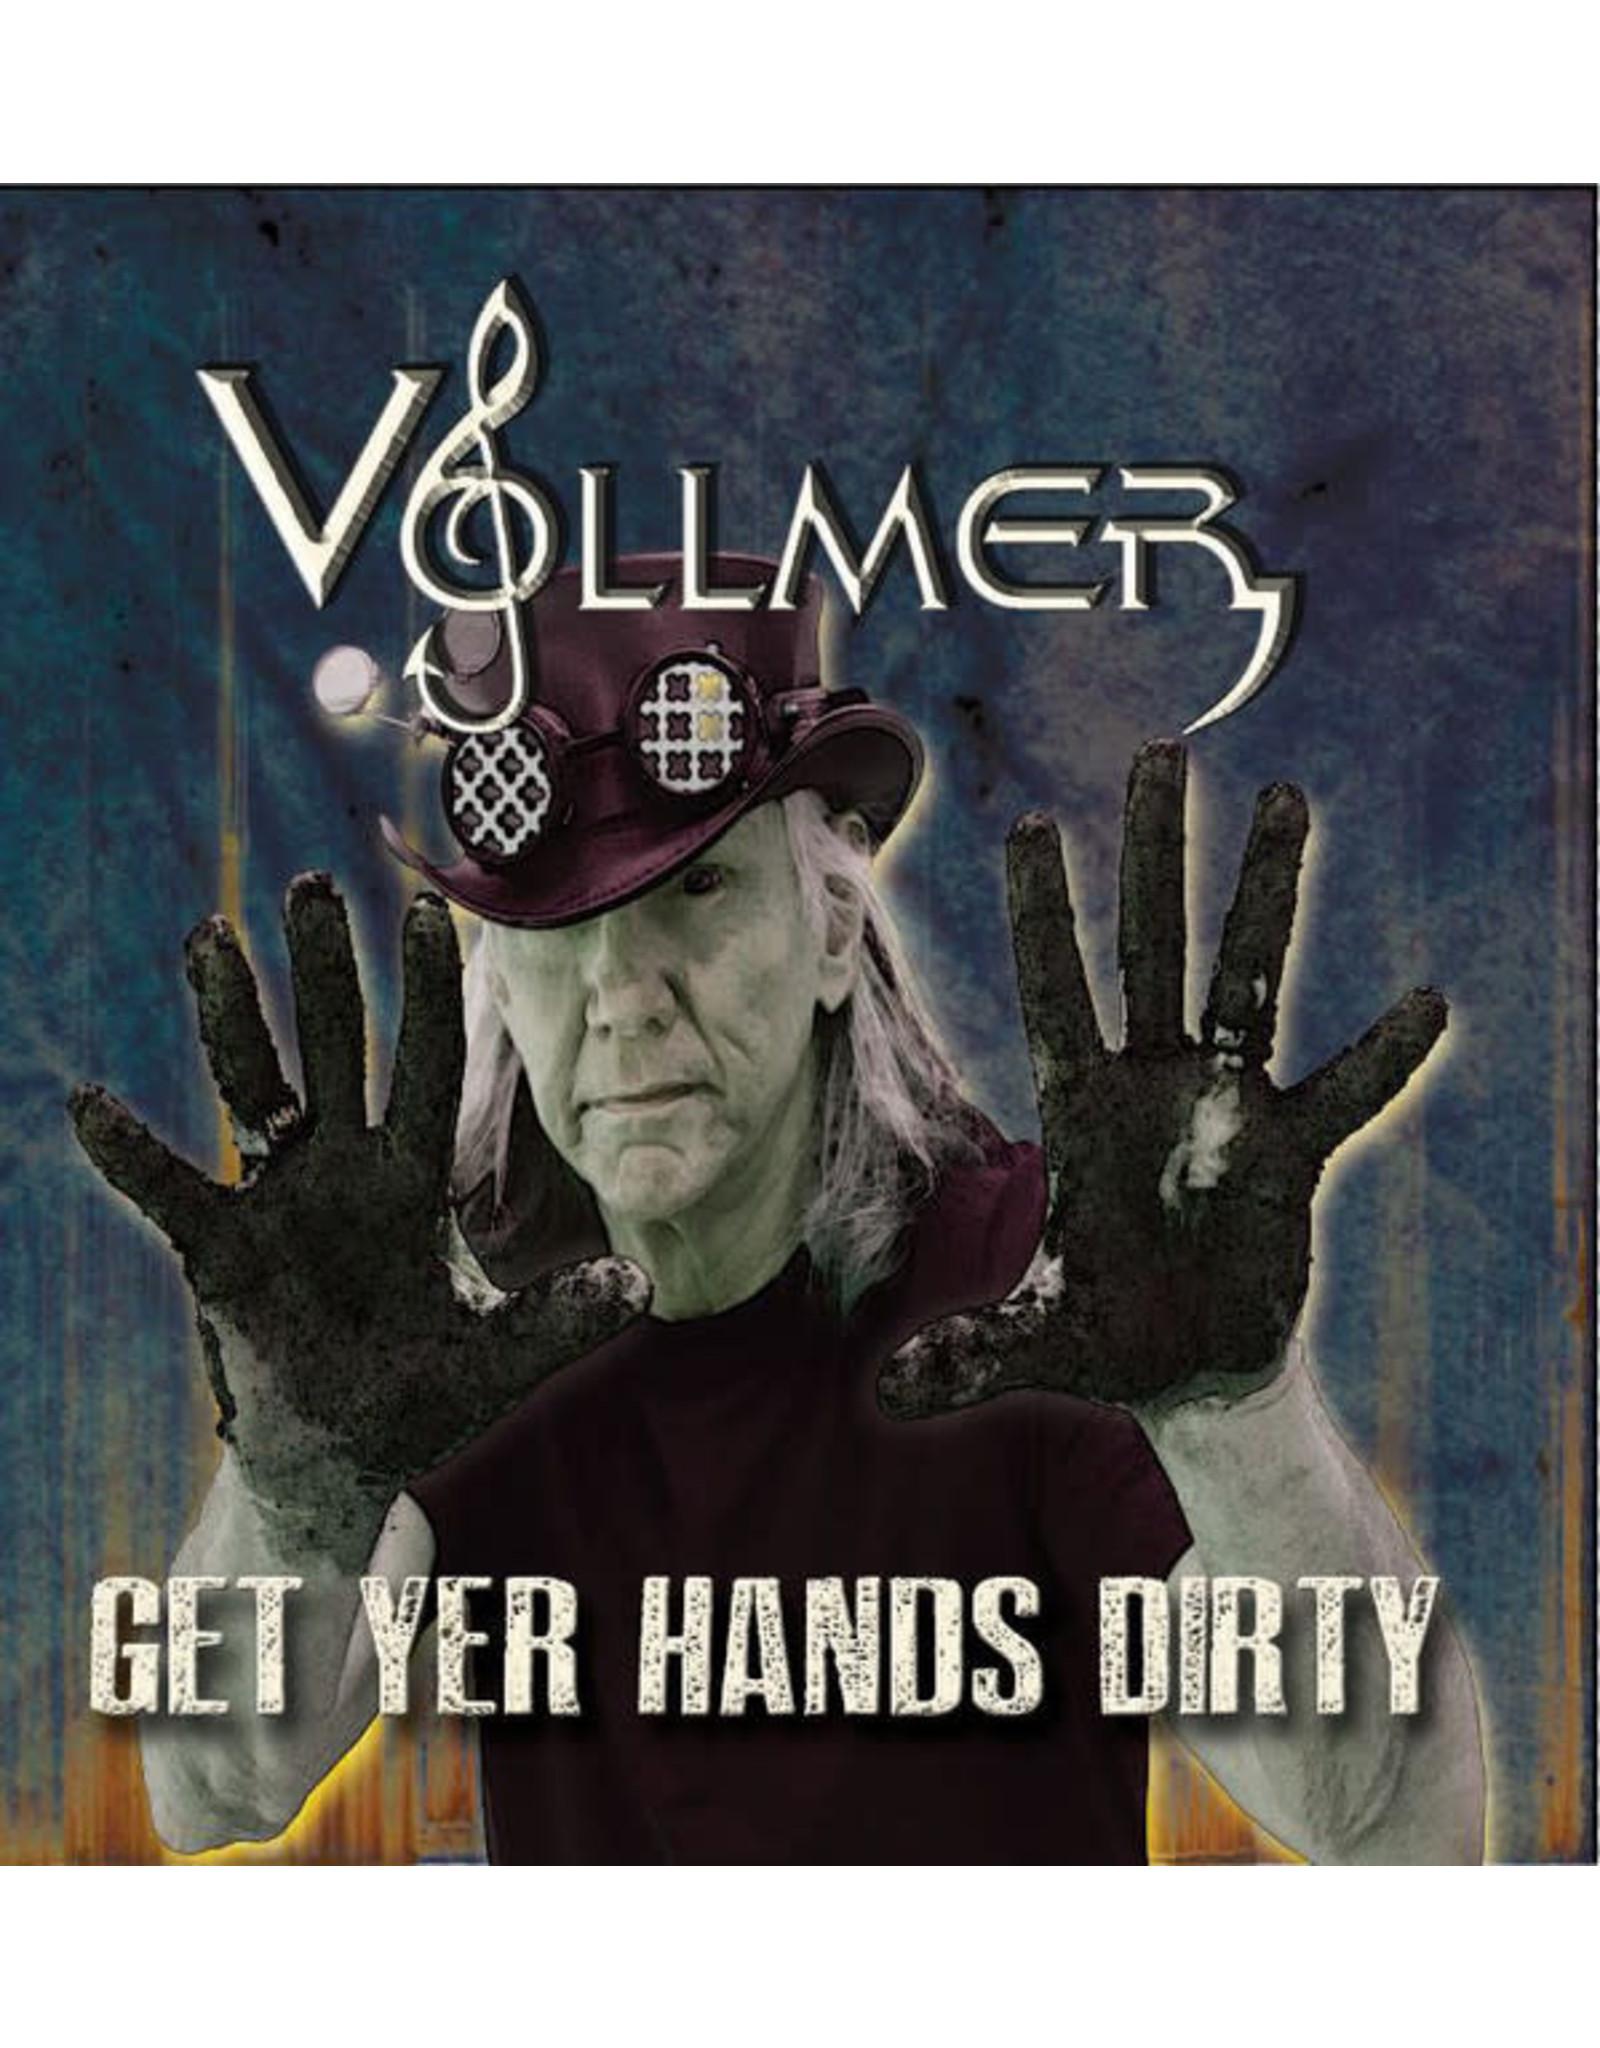 Vollmer, Brian - Get Yer Hands Dirty CD